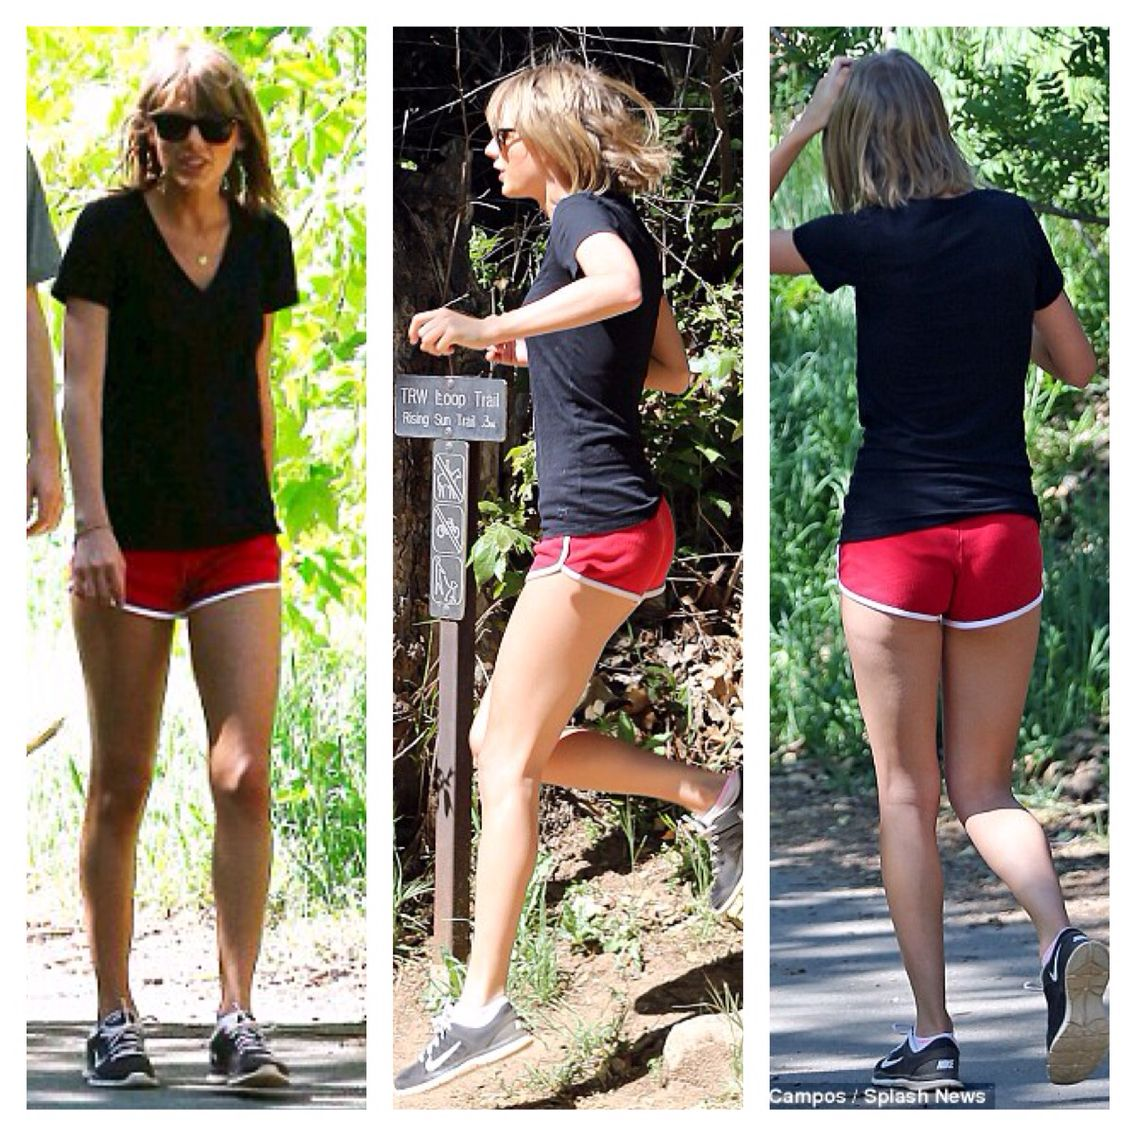 Taylor Swift Gym Workout Wear Taylor Swift Bikini Taylor Swift Style Taylor Swift Hot